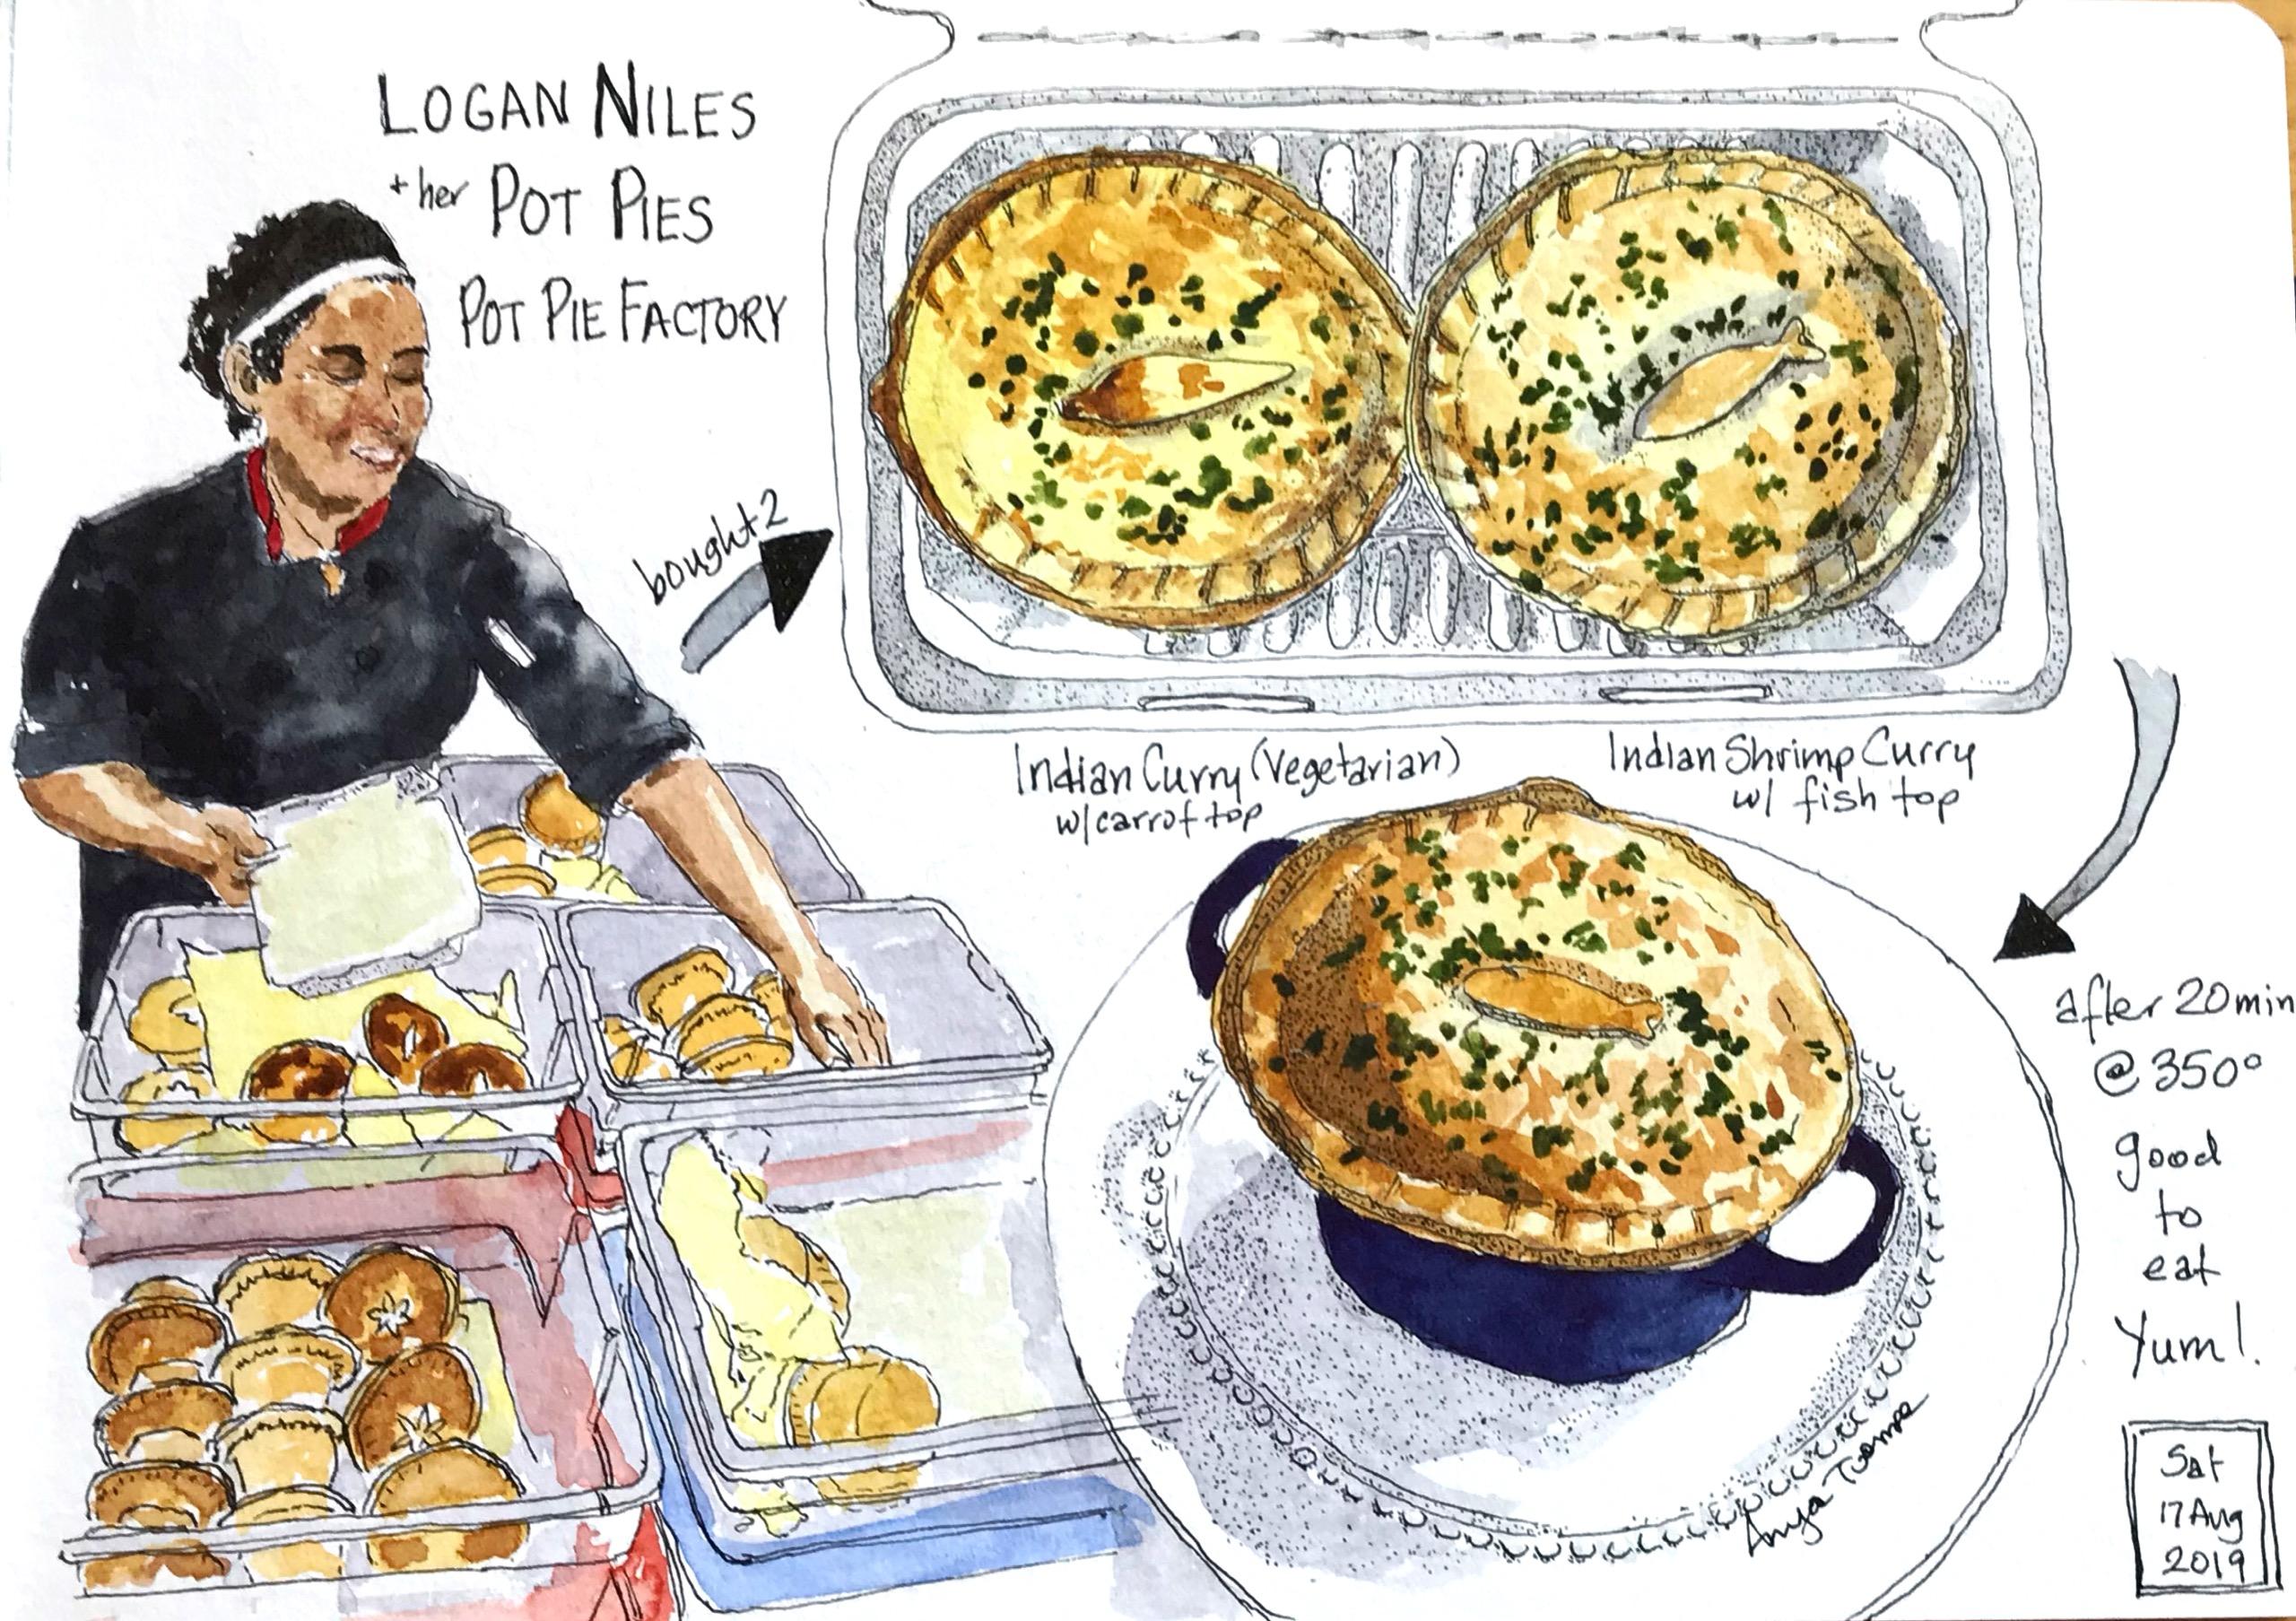 Logan and her Pot Pies! Image